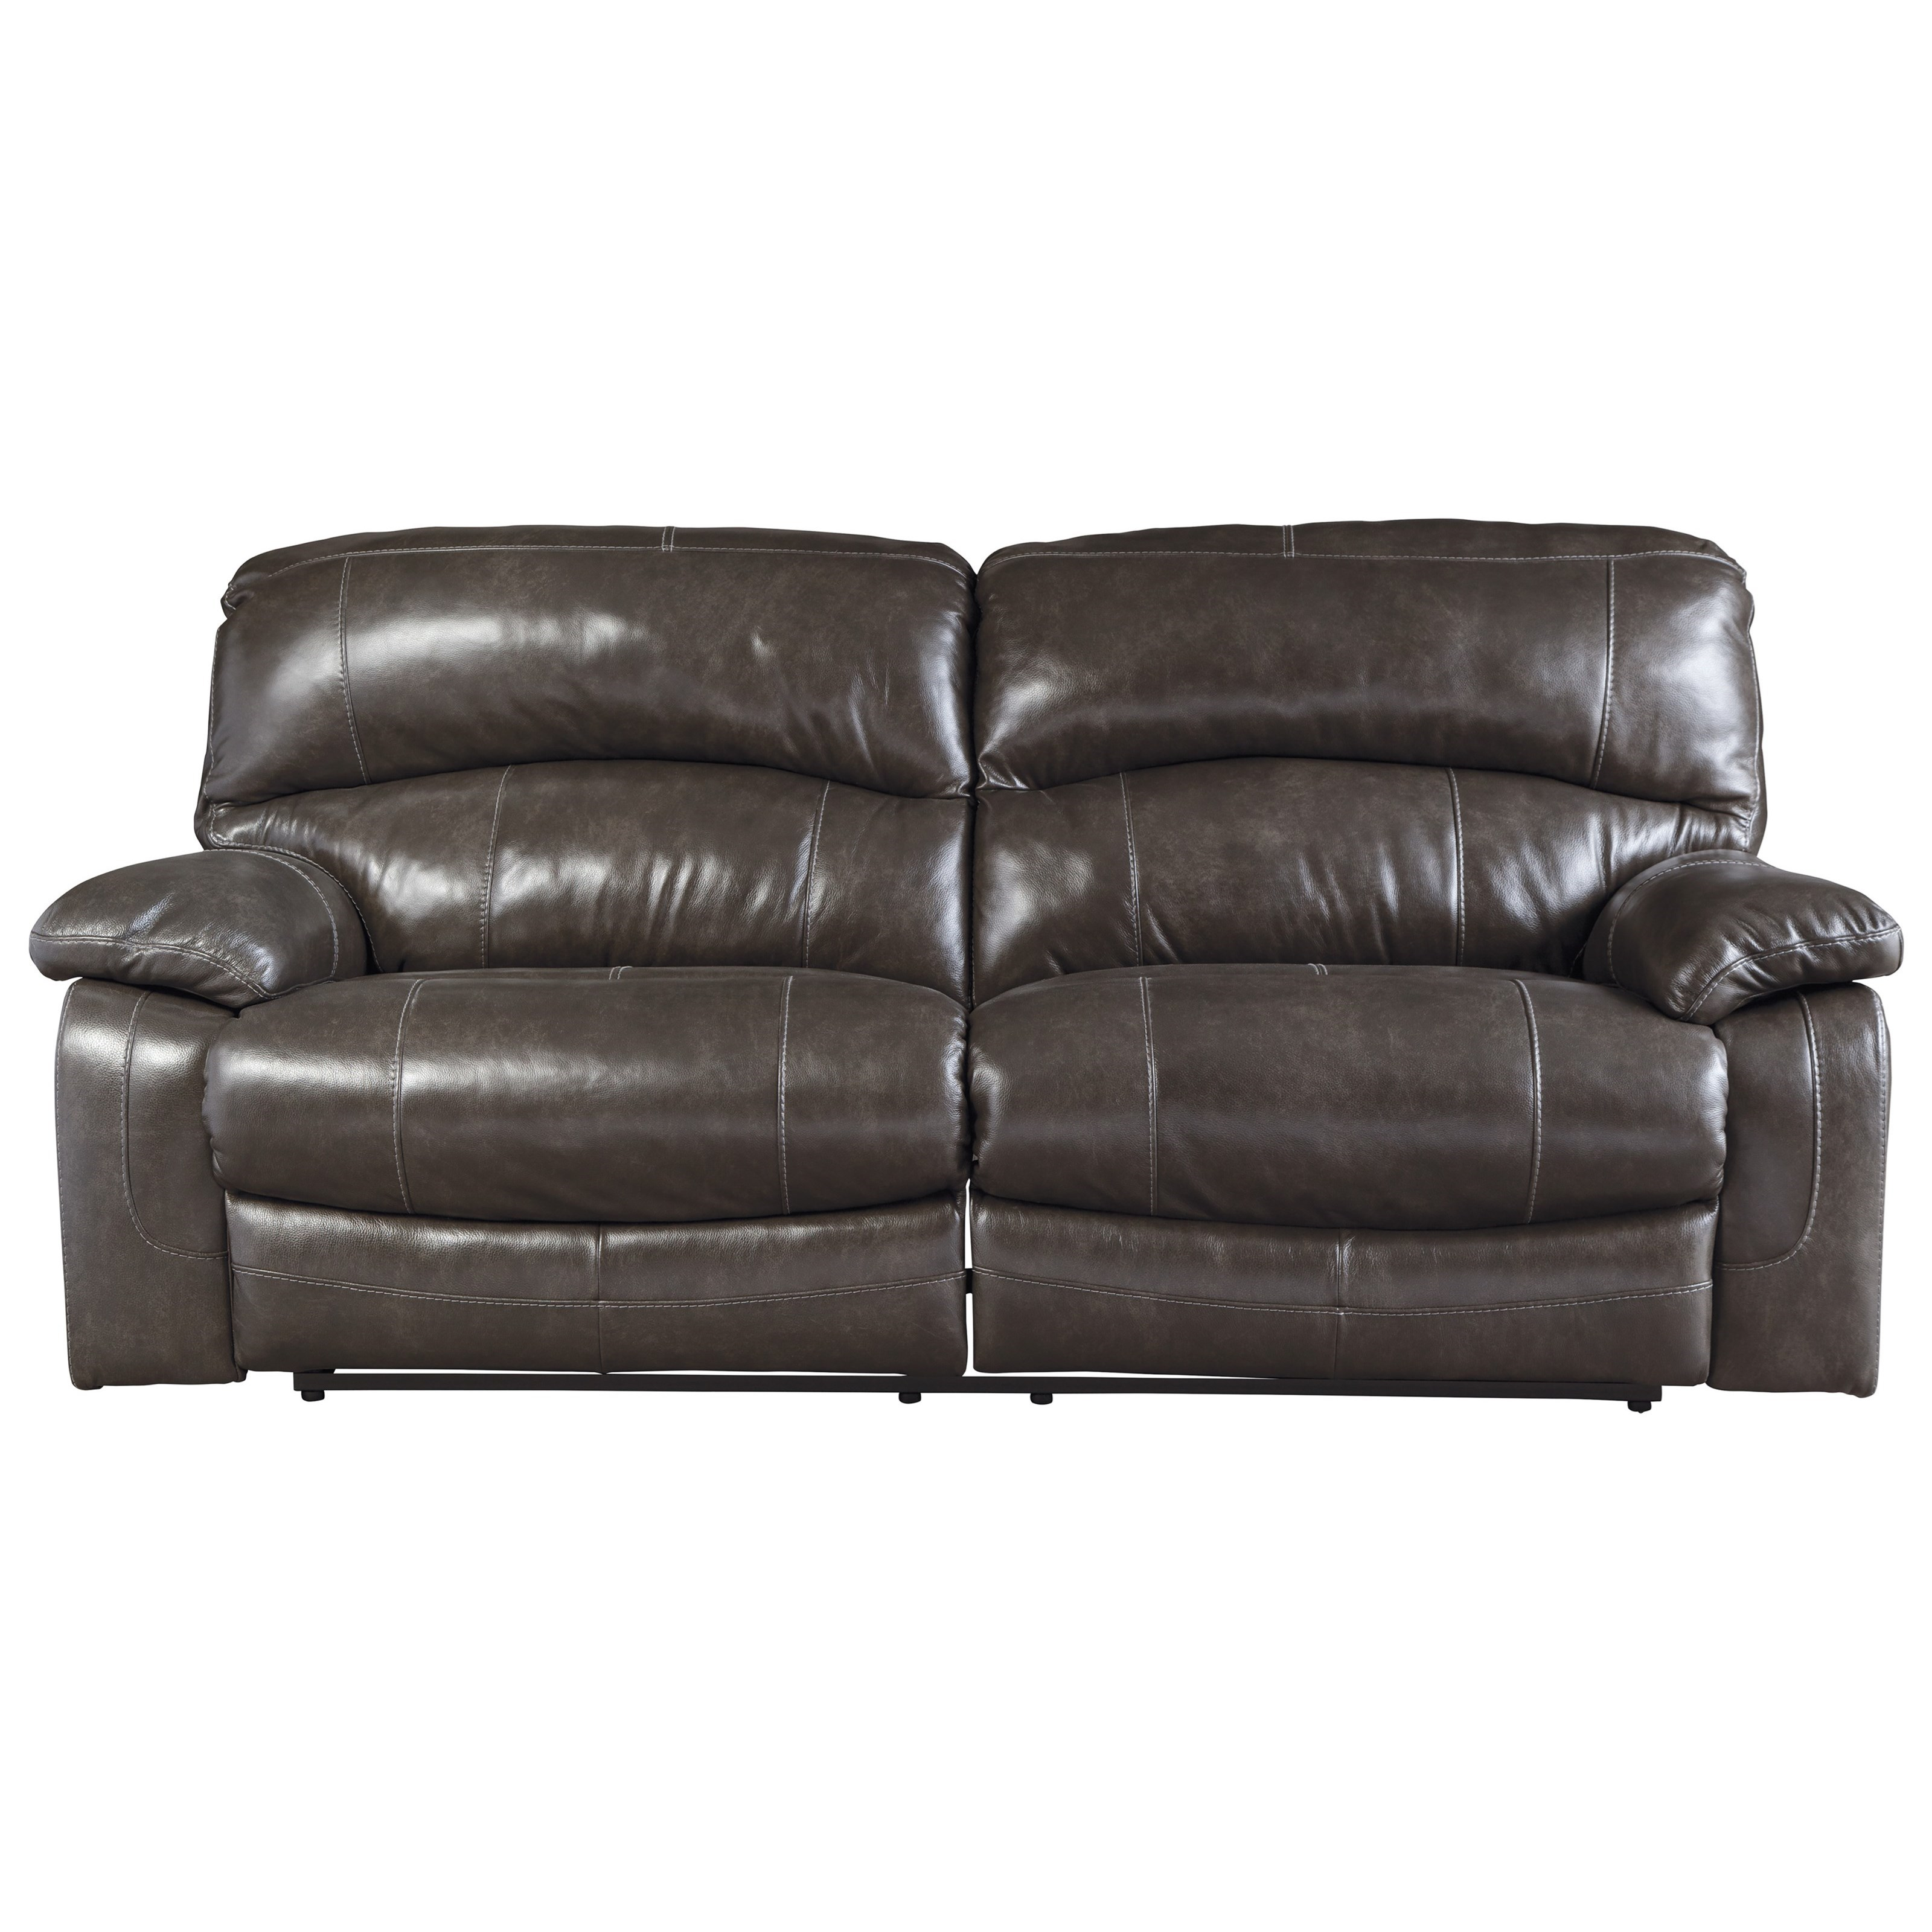 Signature Design By Ashley Damacio Metal U9821347 Leather Match 2 Seat Reclining Power Sofa